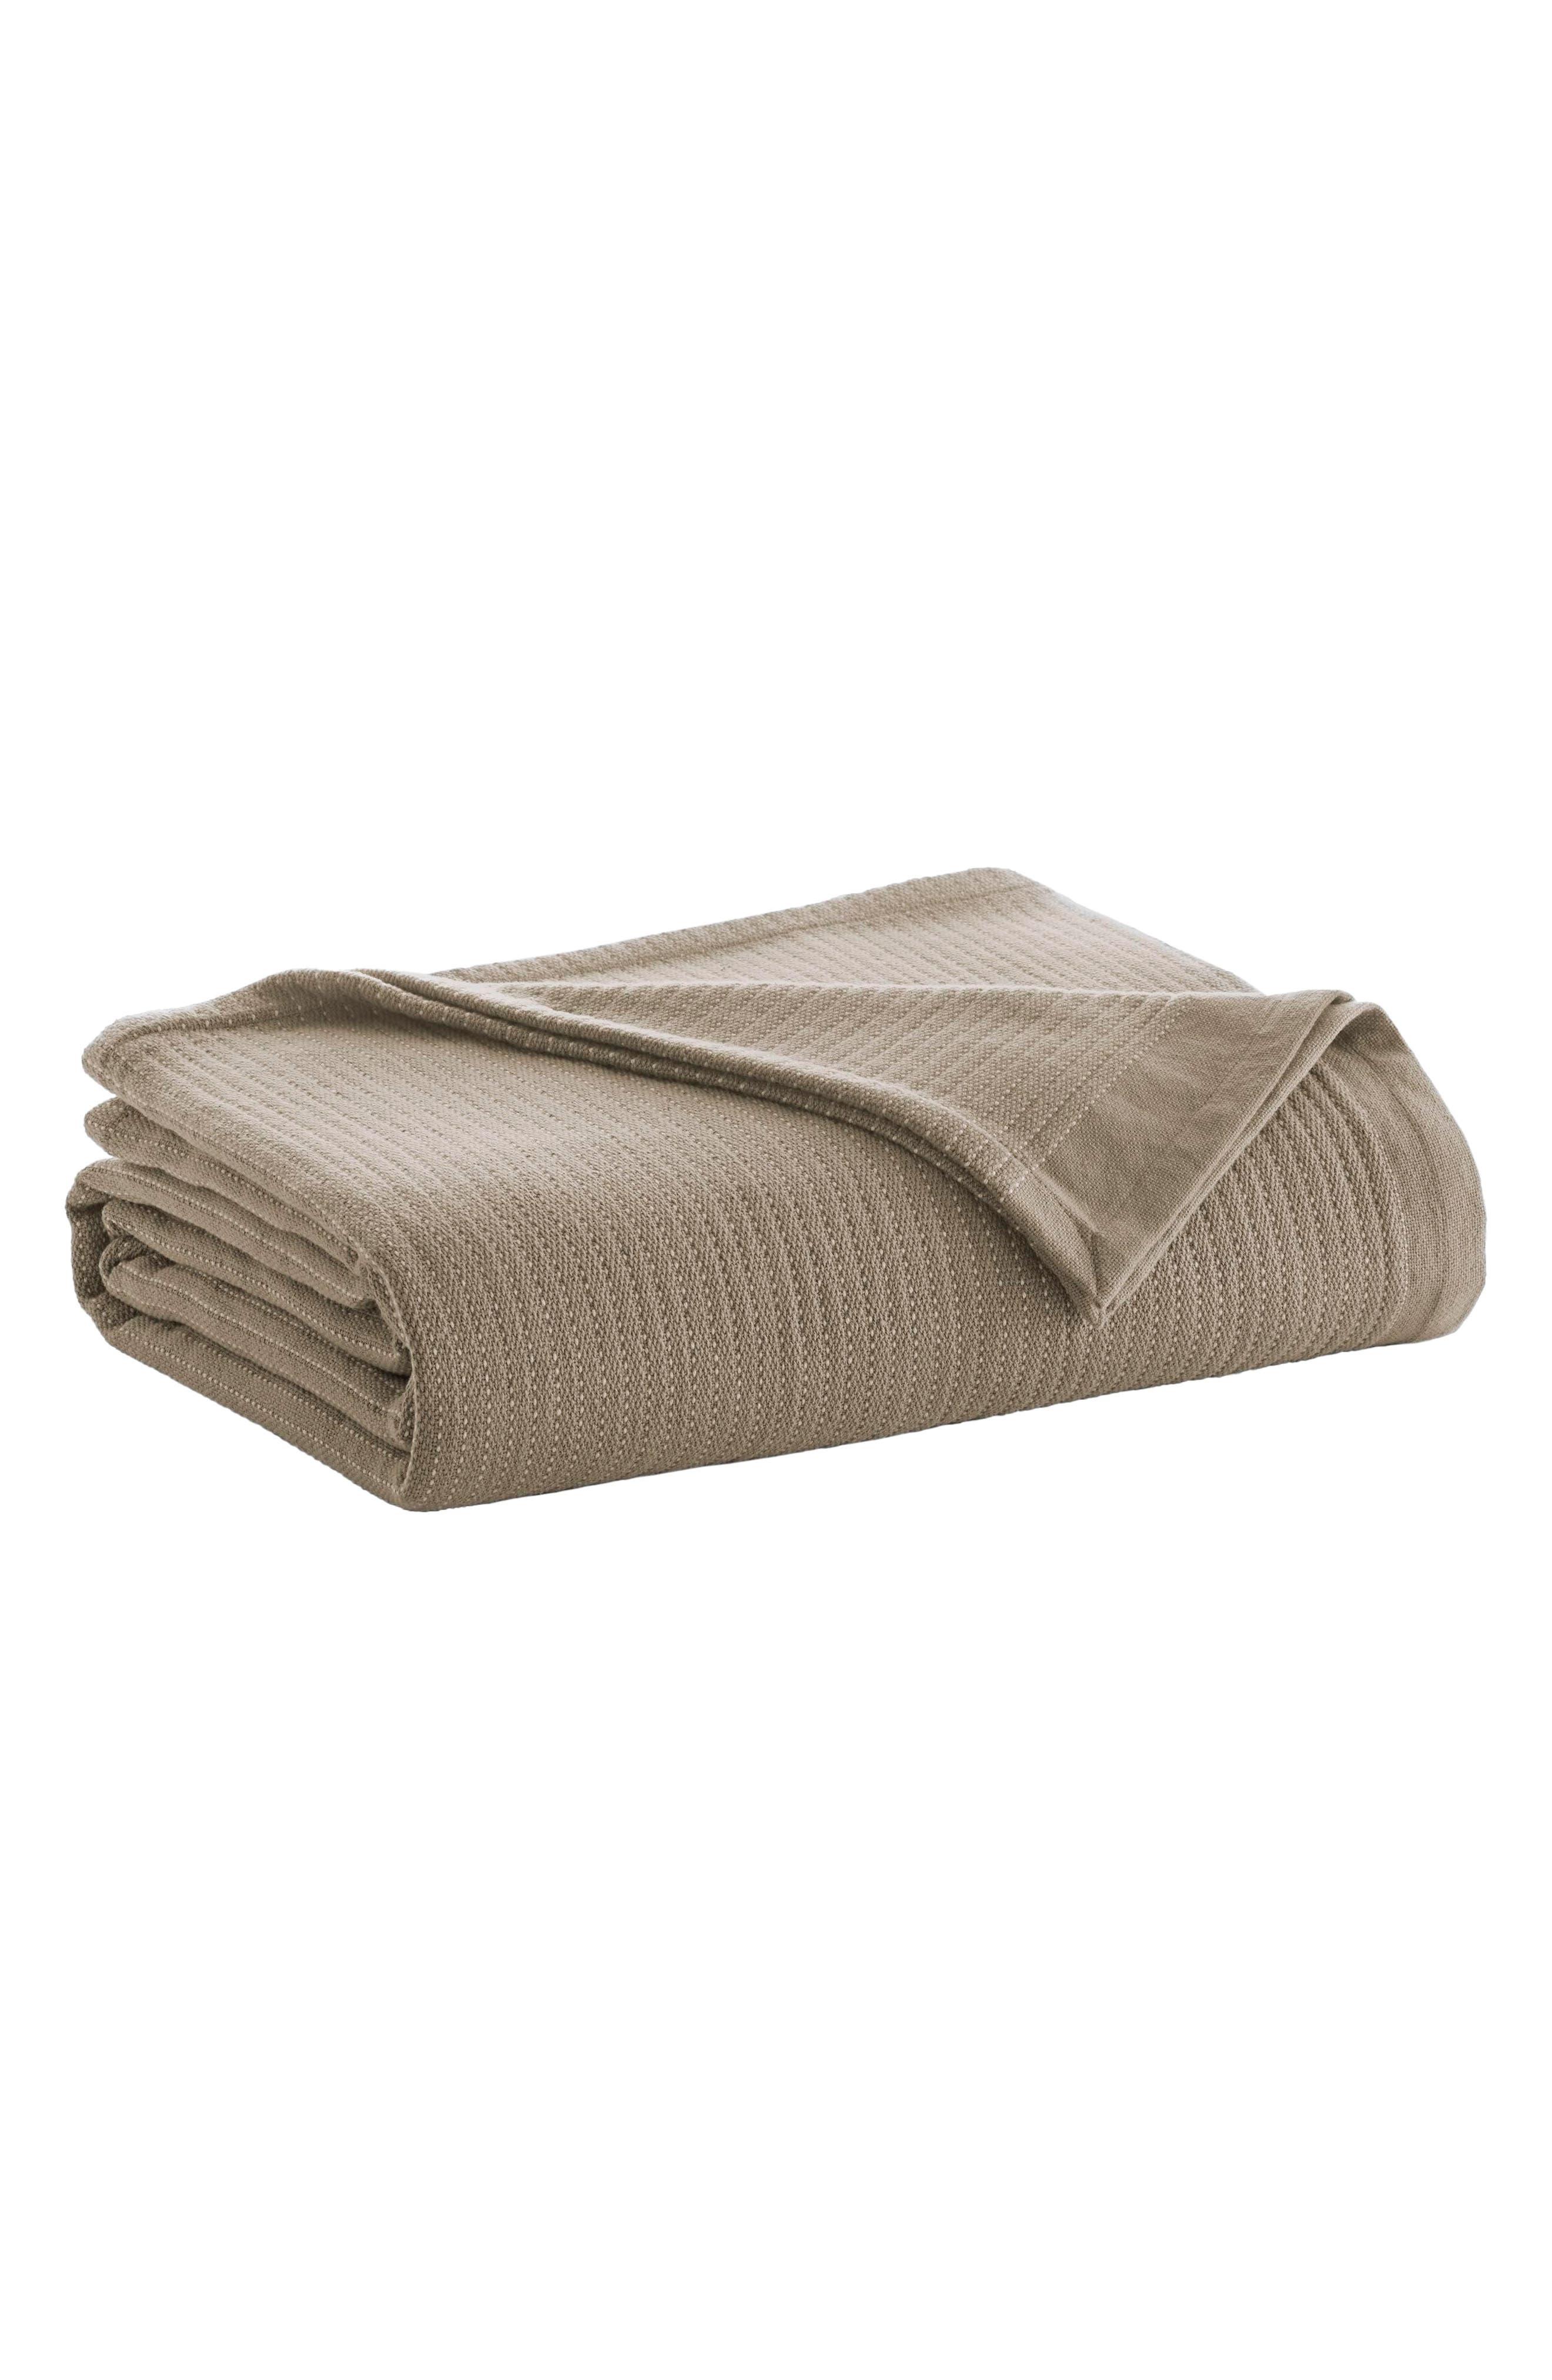 Stripe Blanket,                             Main thumbnail 1, color,                             Camel/ Ivory